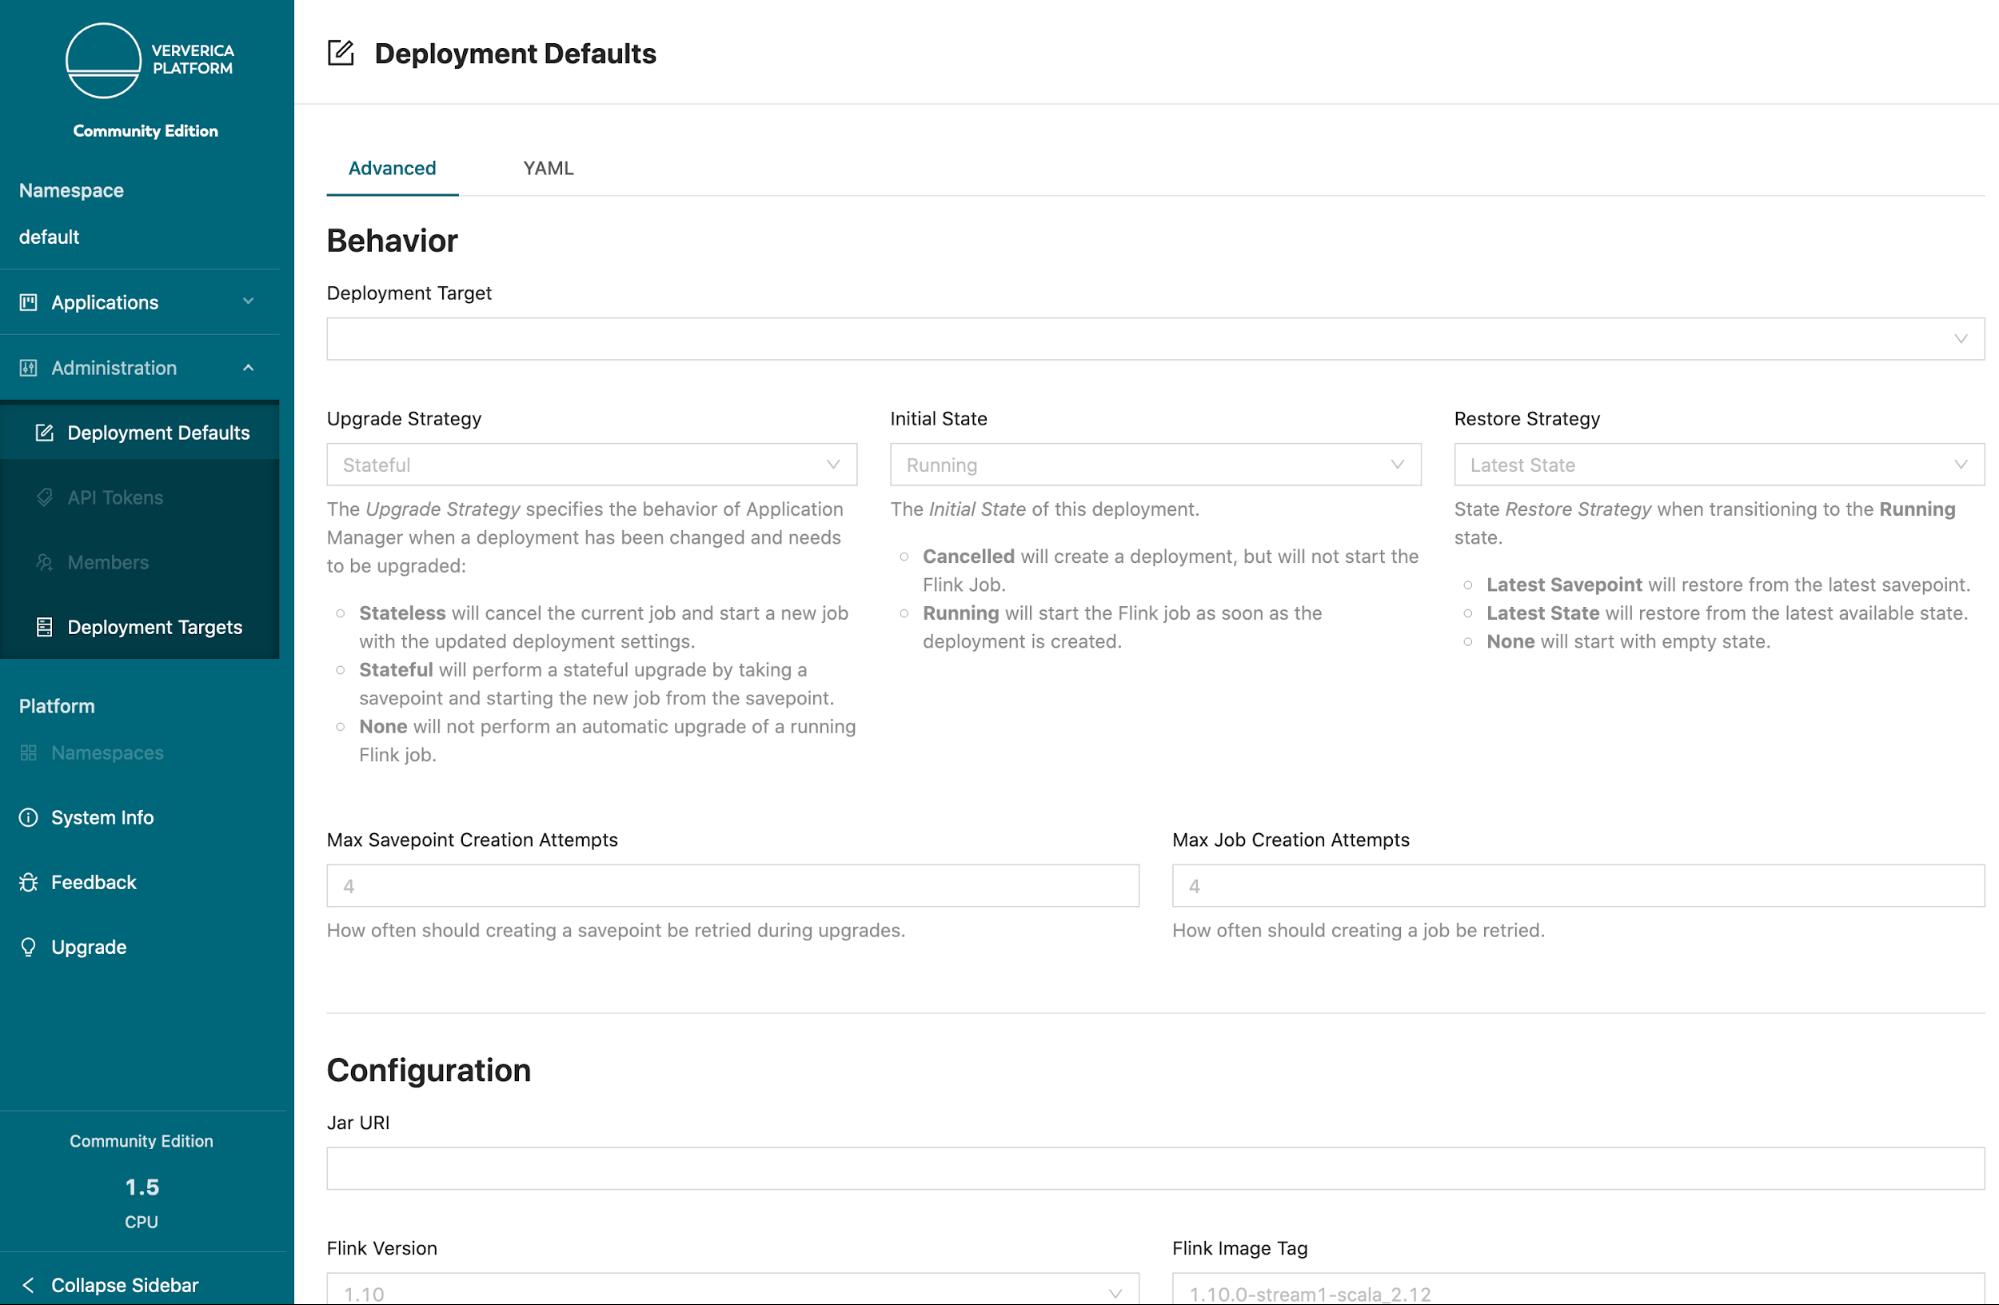 Ververica Platform Community Edition, Deployment Defaults, Flink deployments, Kubernetes, Flink on K8s